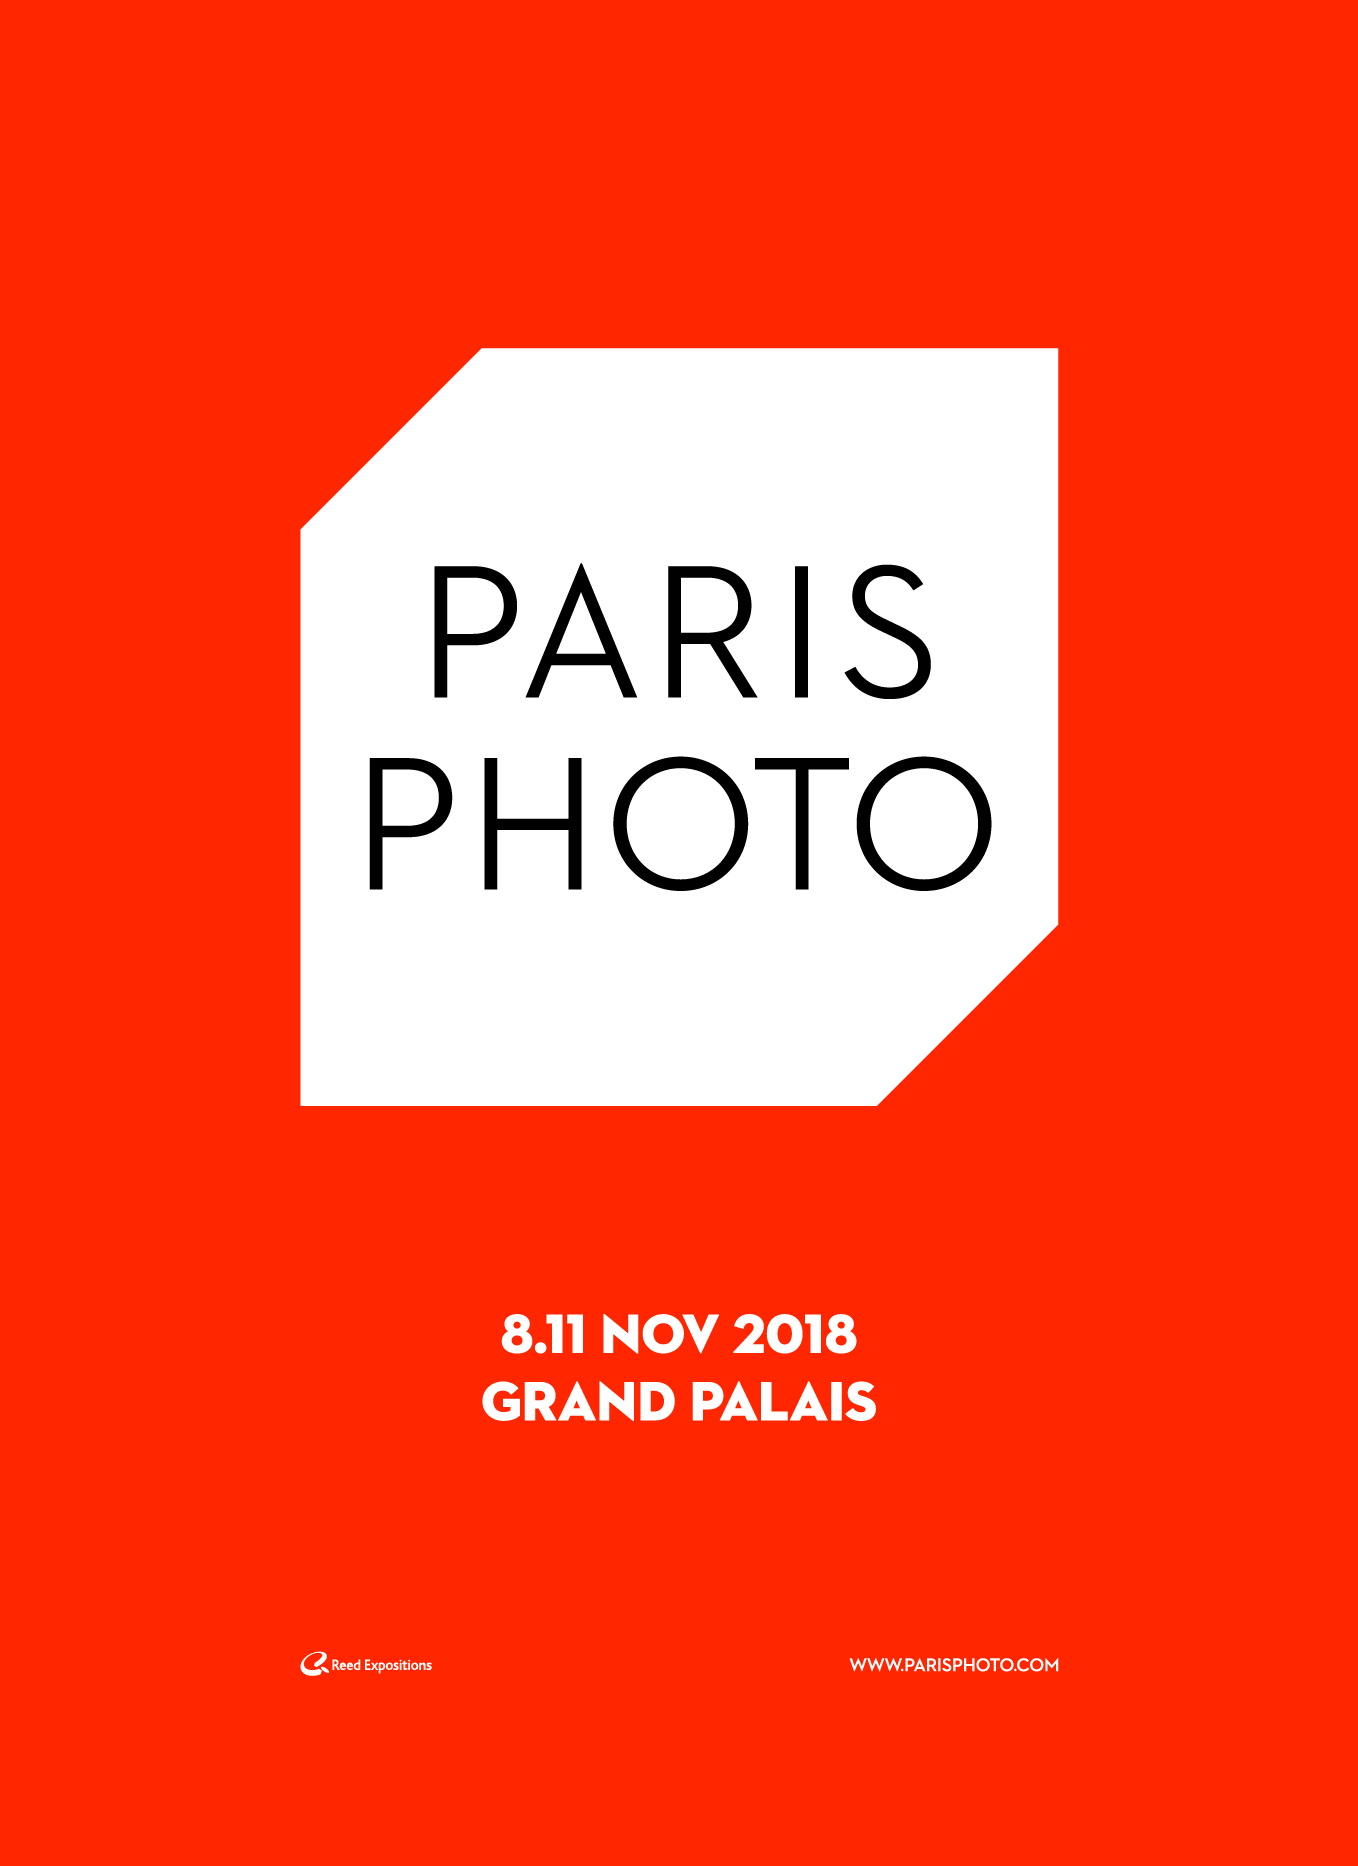 https://www.parisphoto.com/en/Home/